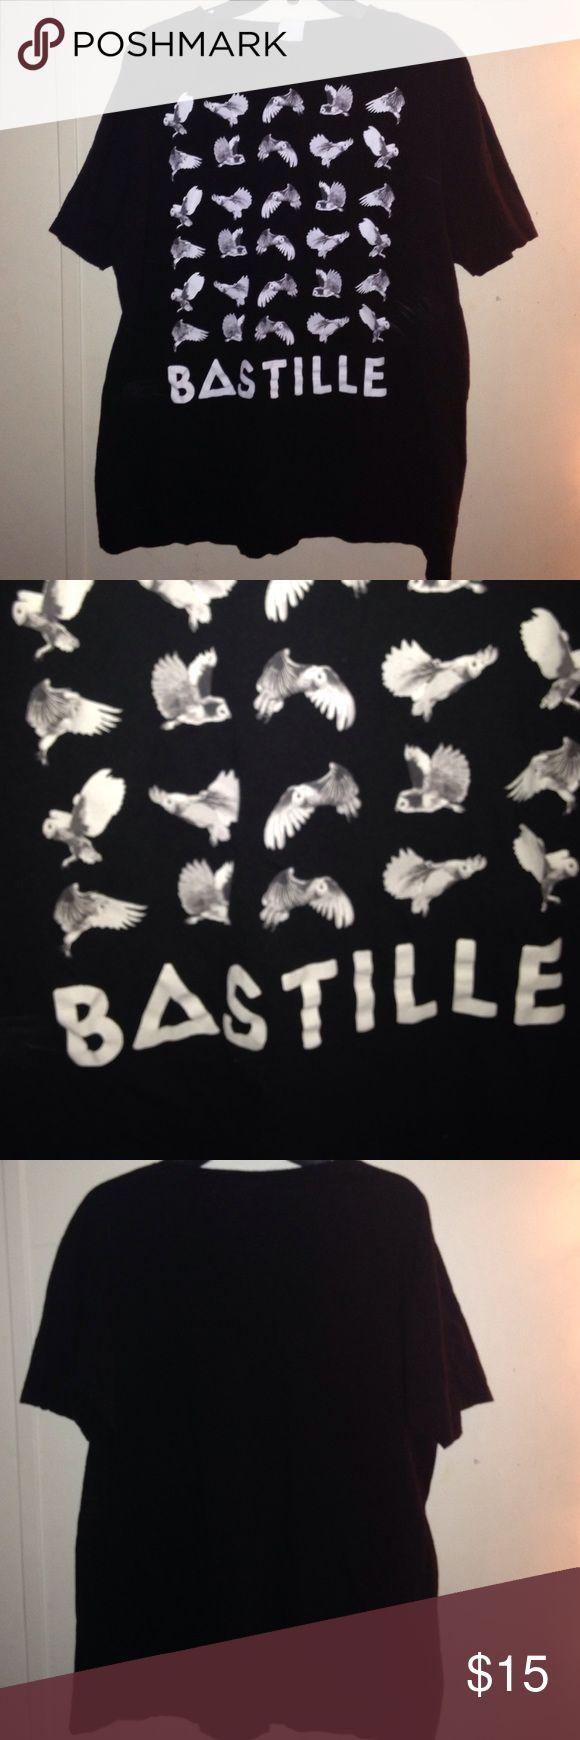 bastille band info